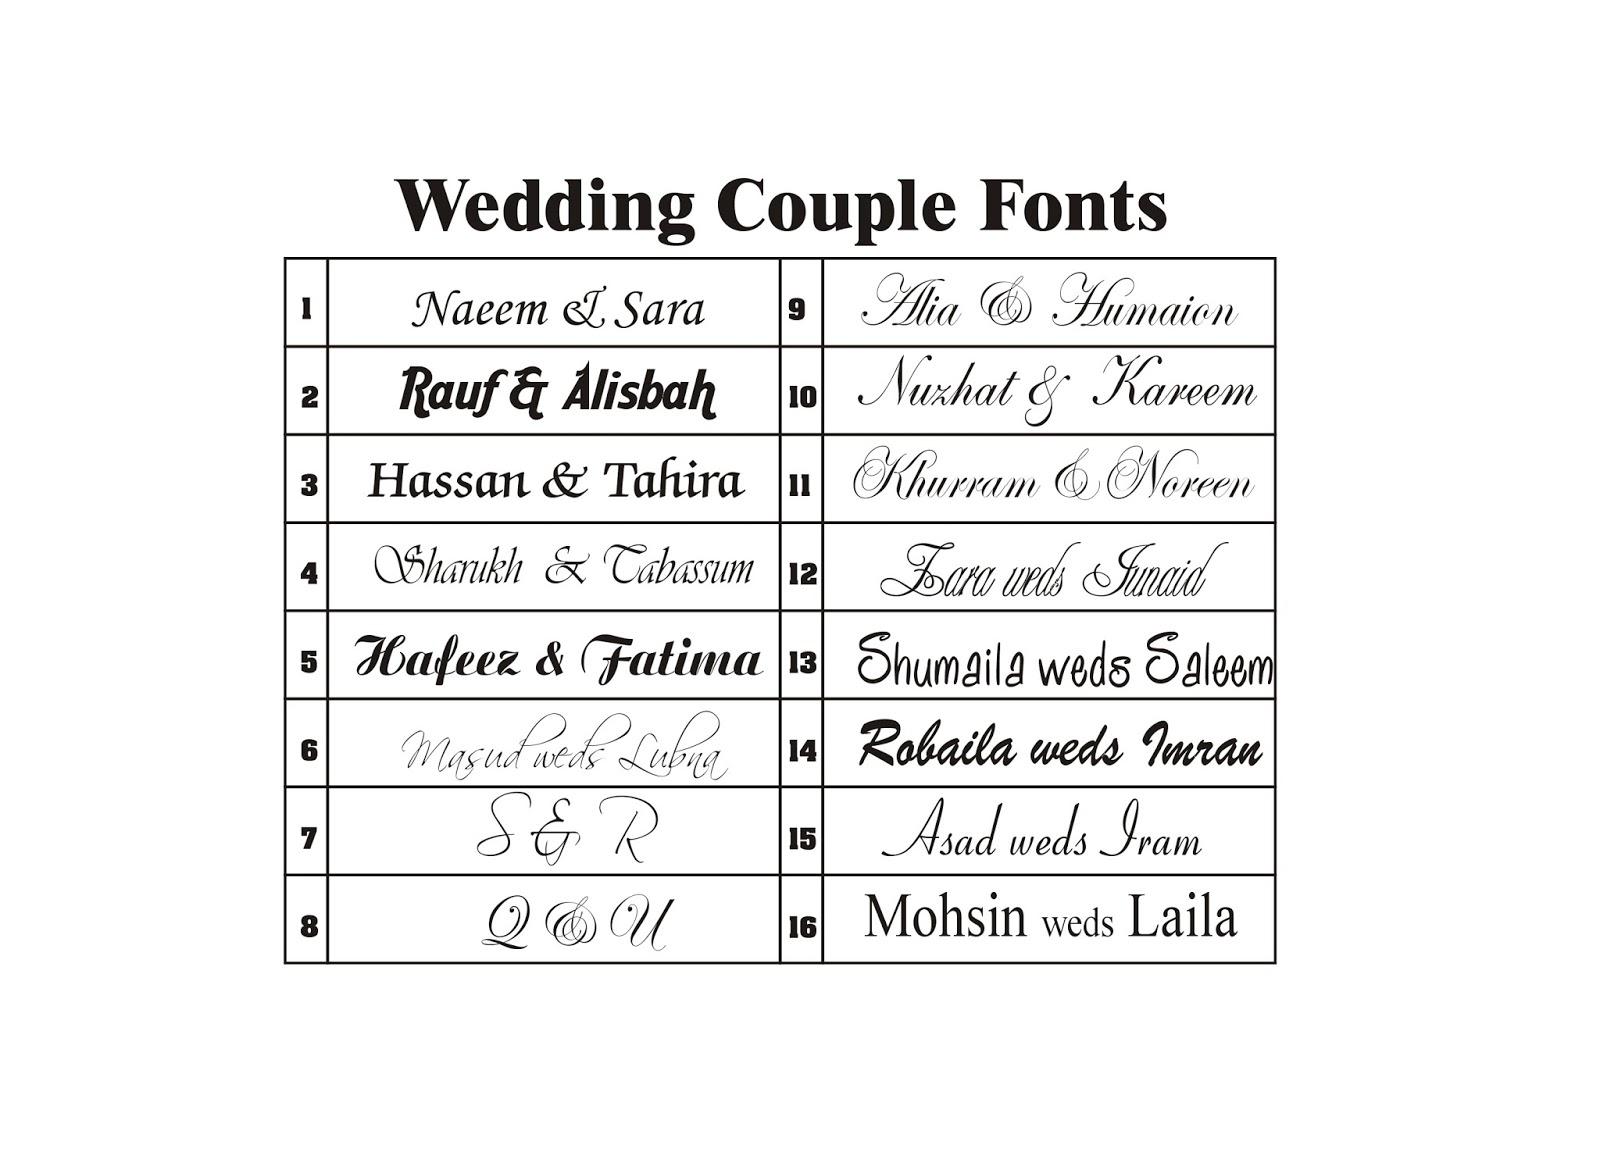 Zem printers pakistani wedding card wording grooms mother inviting father deceased stopboris Choice Image